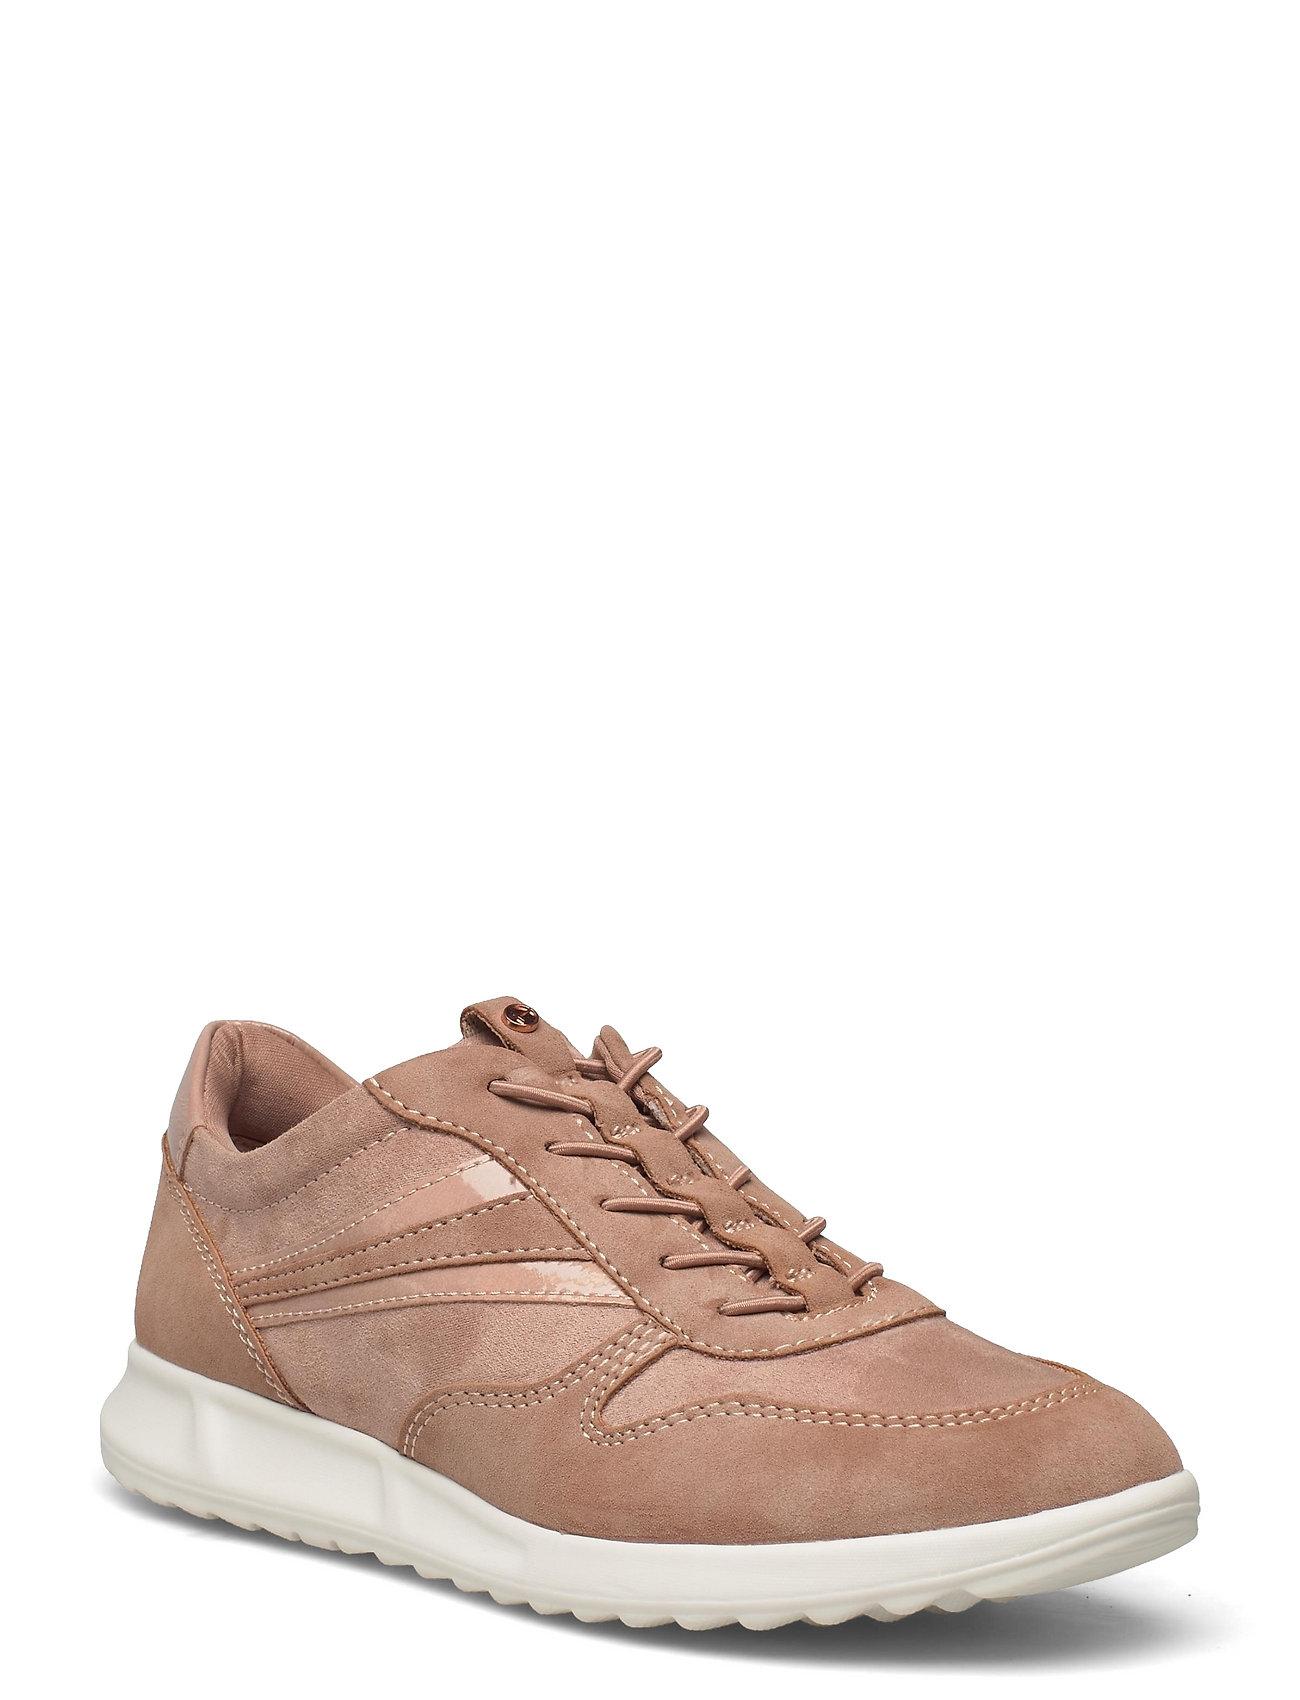 Woms Lace-Up Low-top Sneakers Beige Tamaris